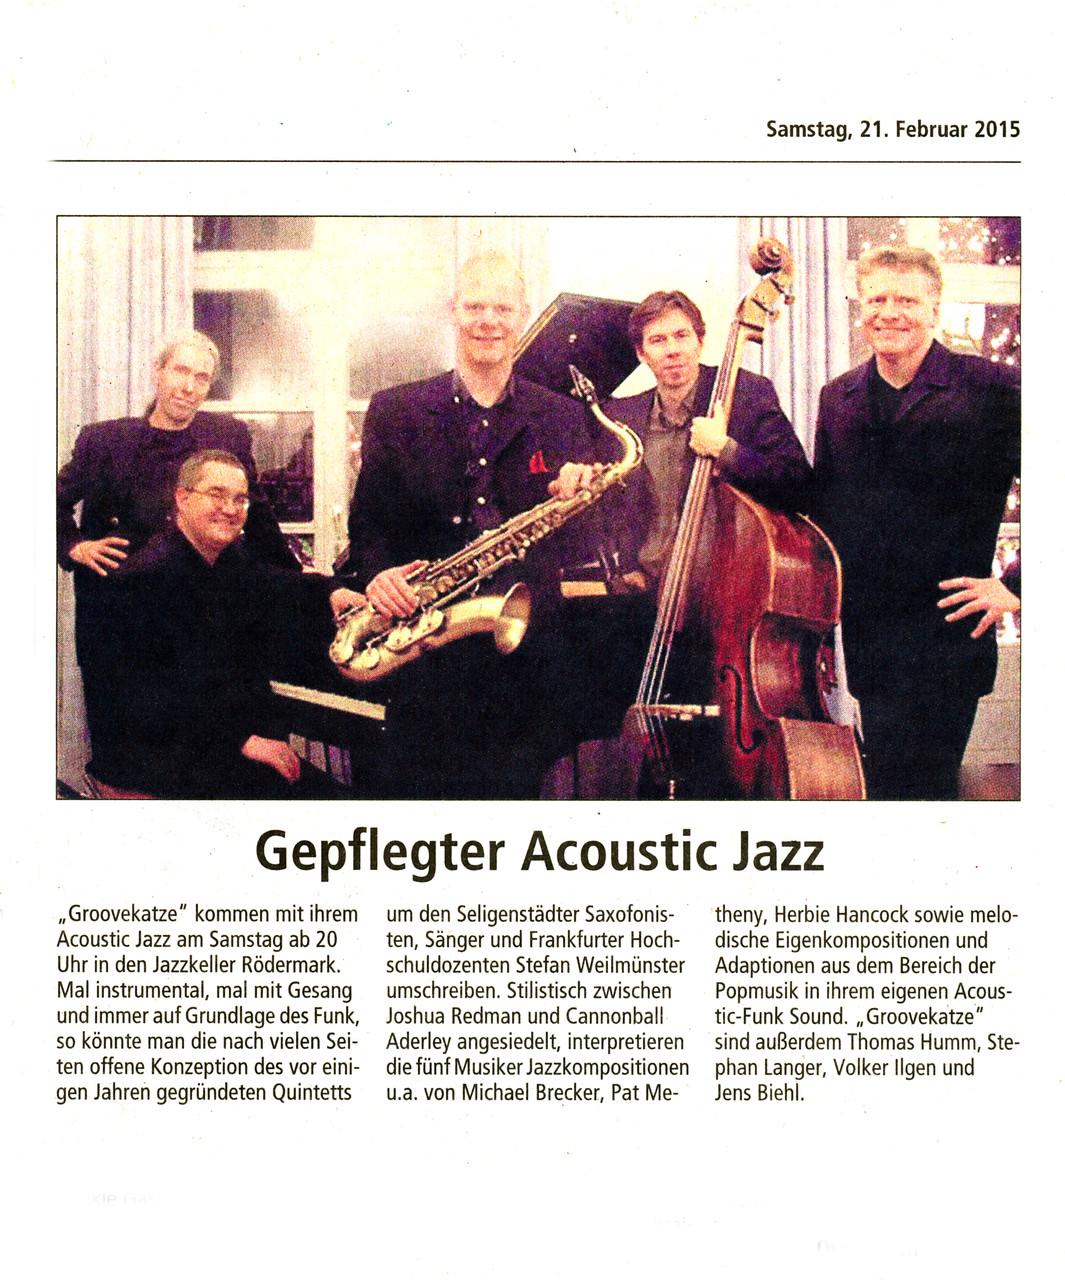 Offenbach Post, 21. Februar 2015